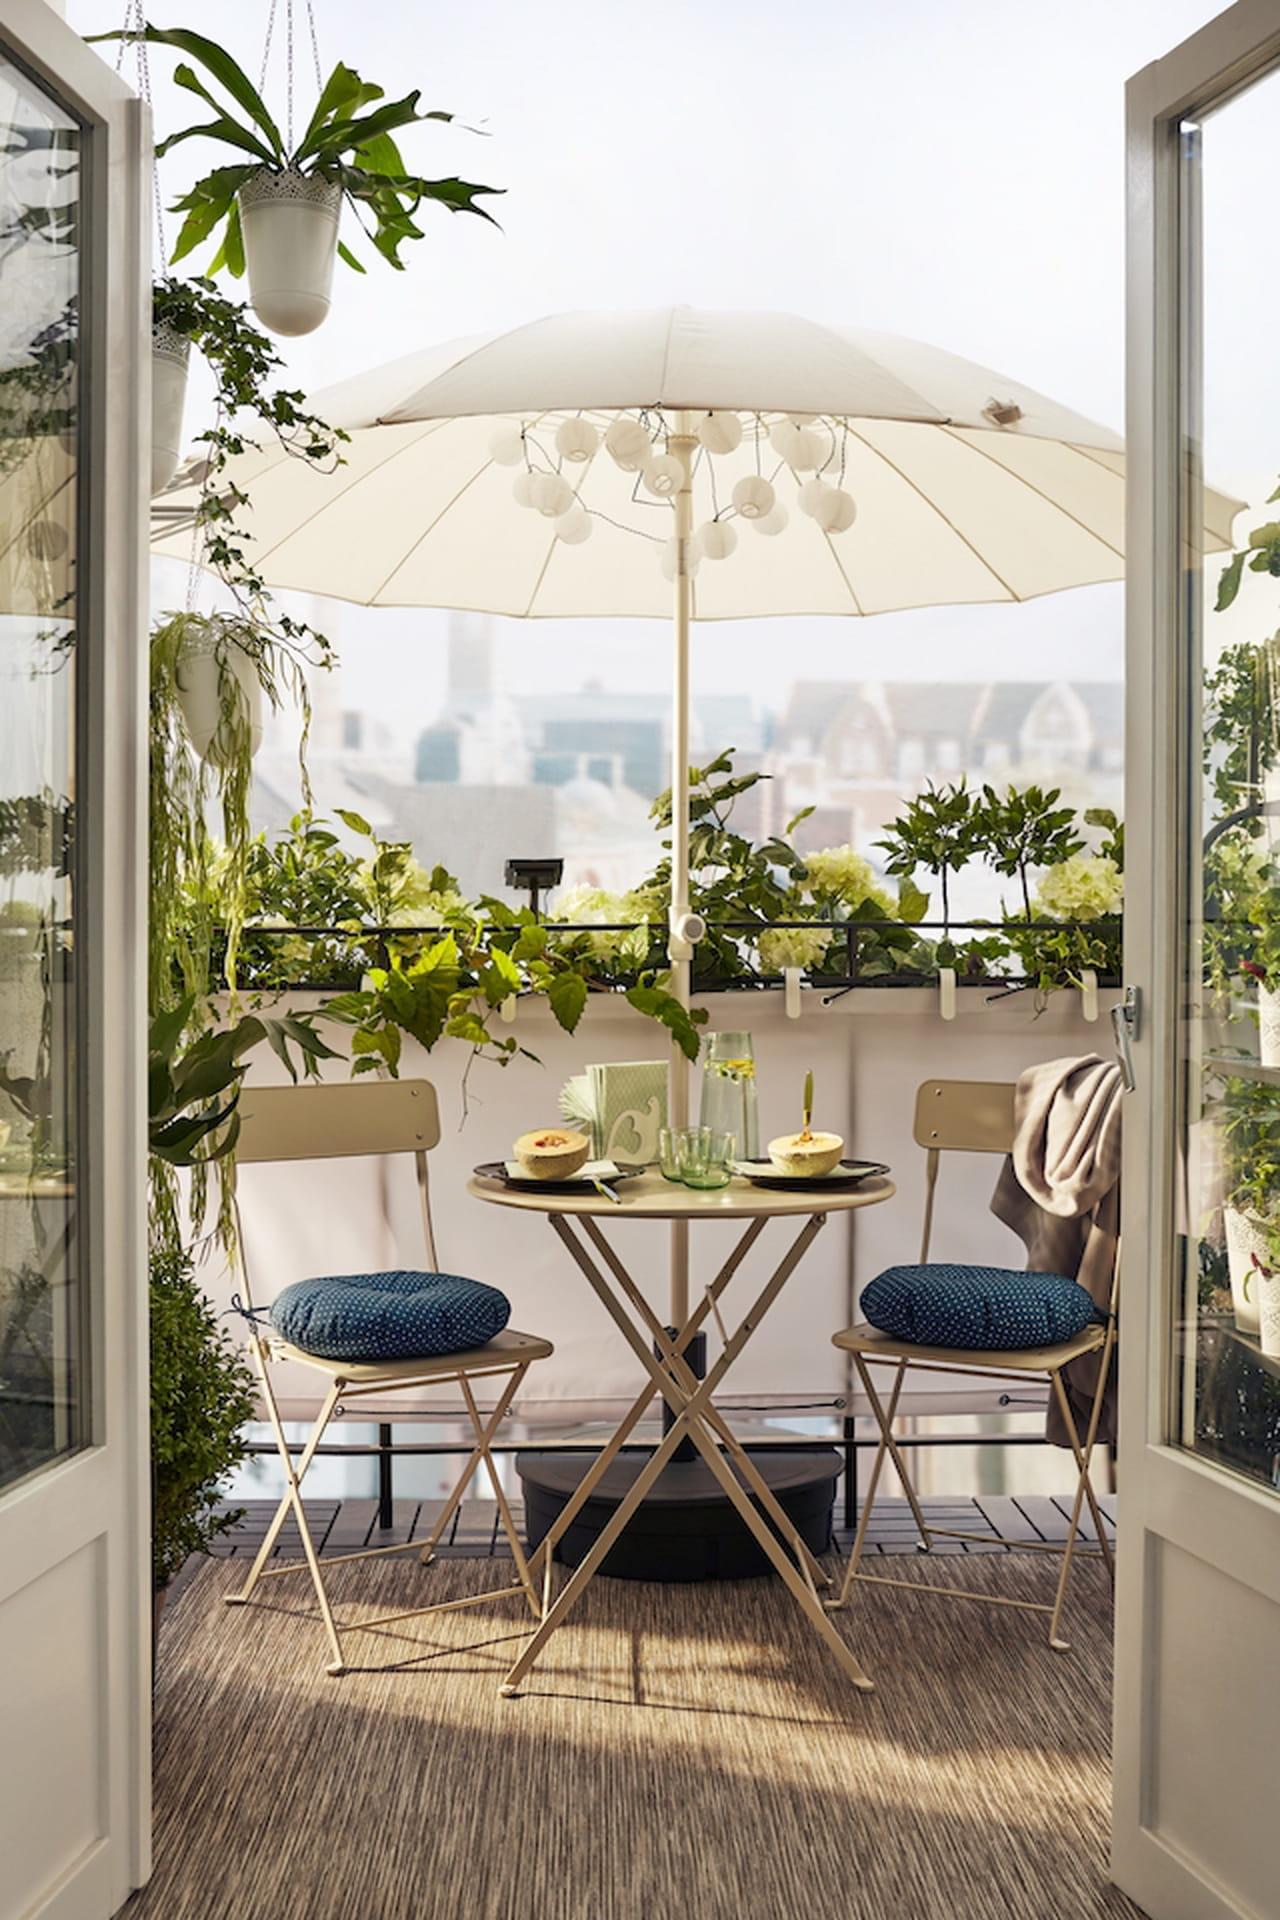 Ikea giardino 2017: outdoor conviviale